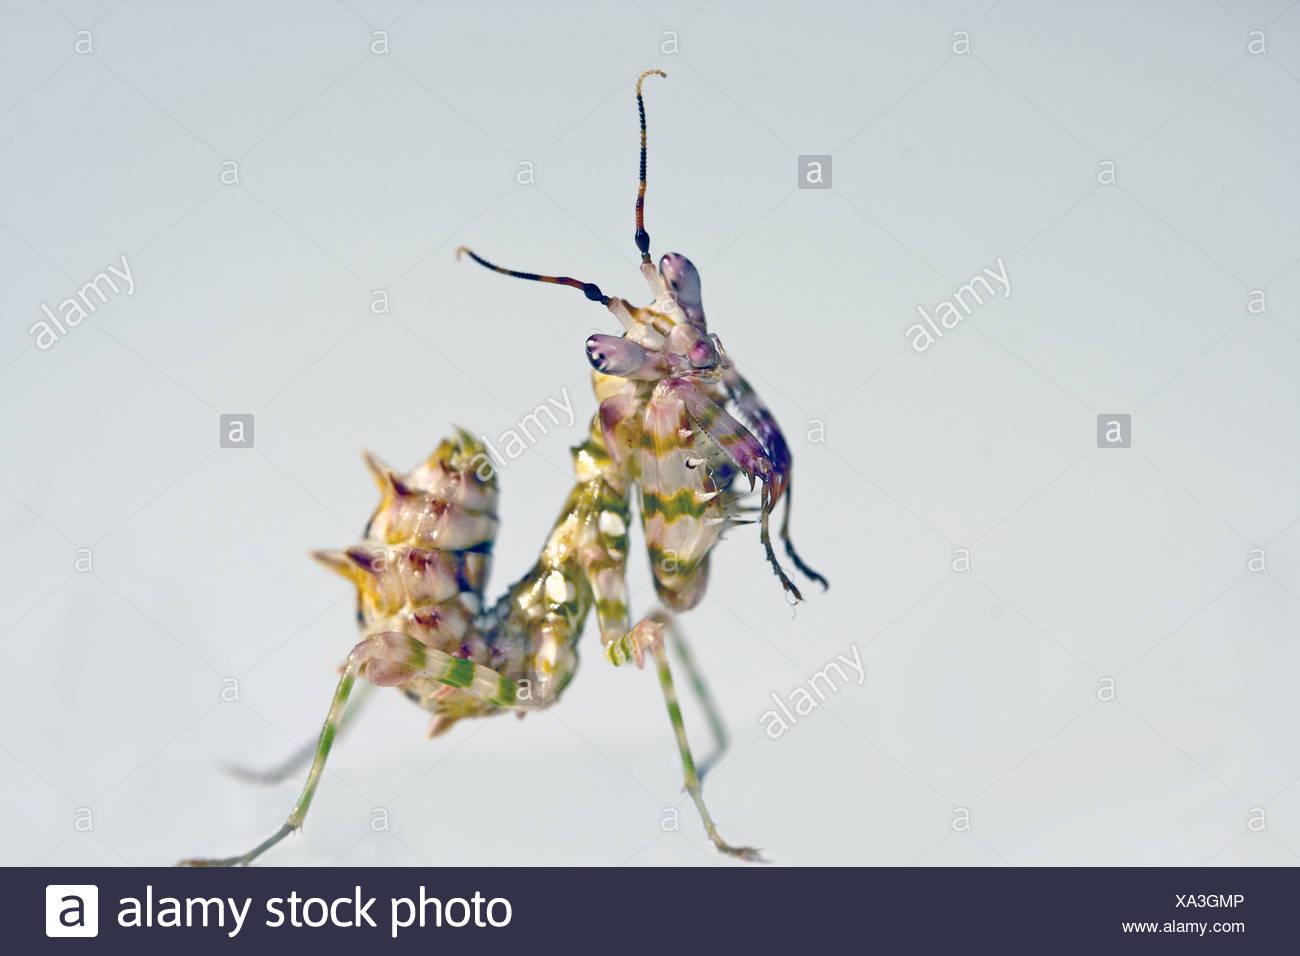 Preying Mantis - Stock Image